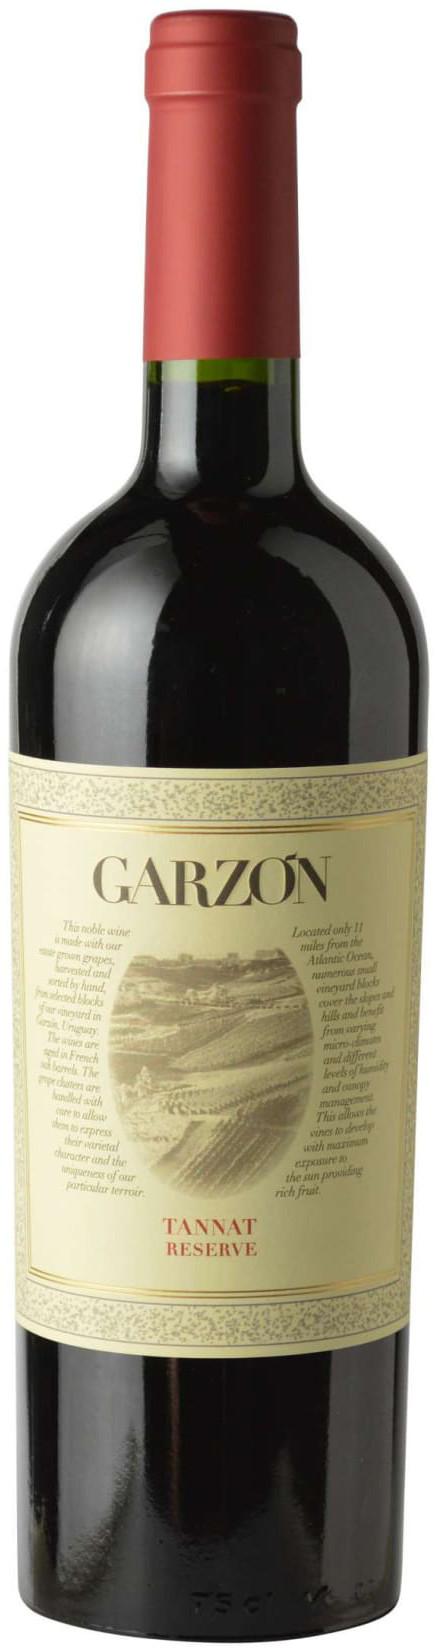 Bodega Garzon Uruguay Reserve Tannat 2018 red wine